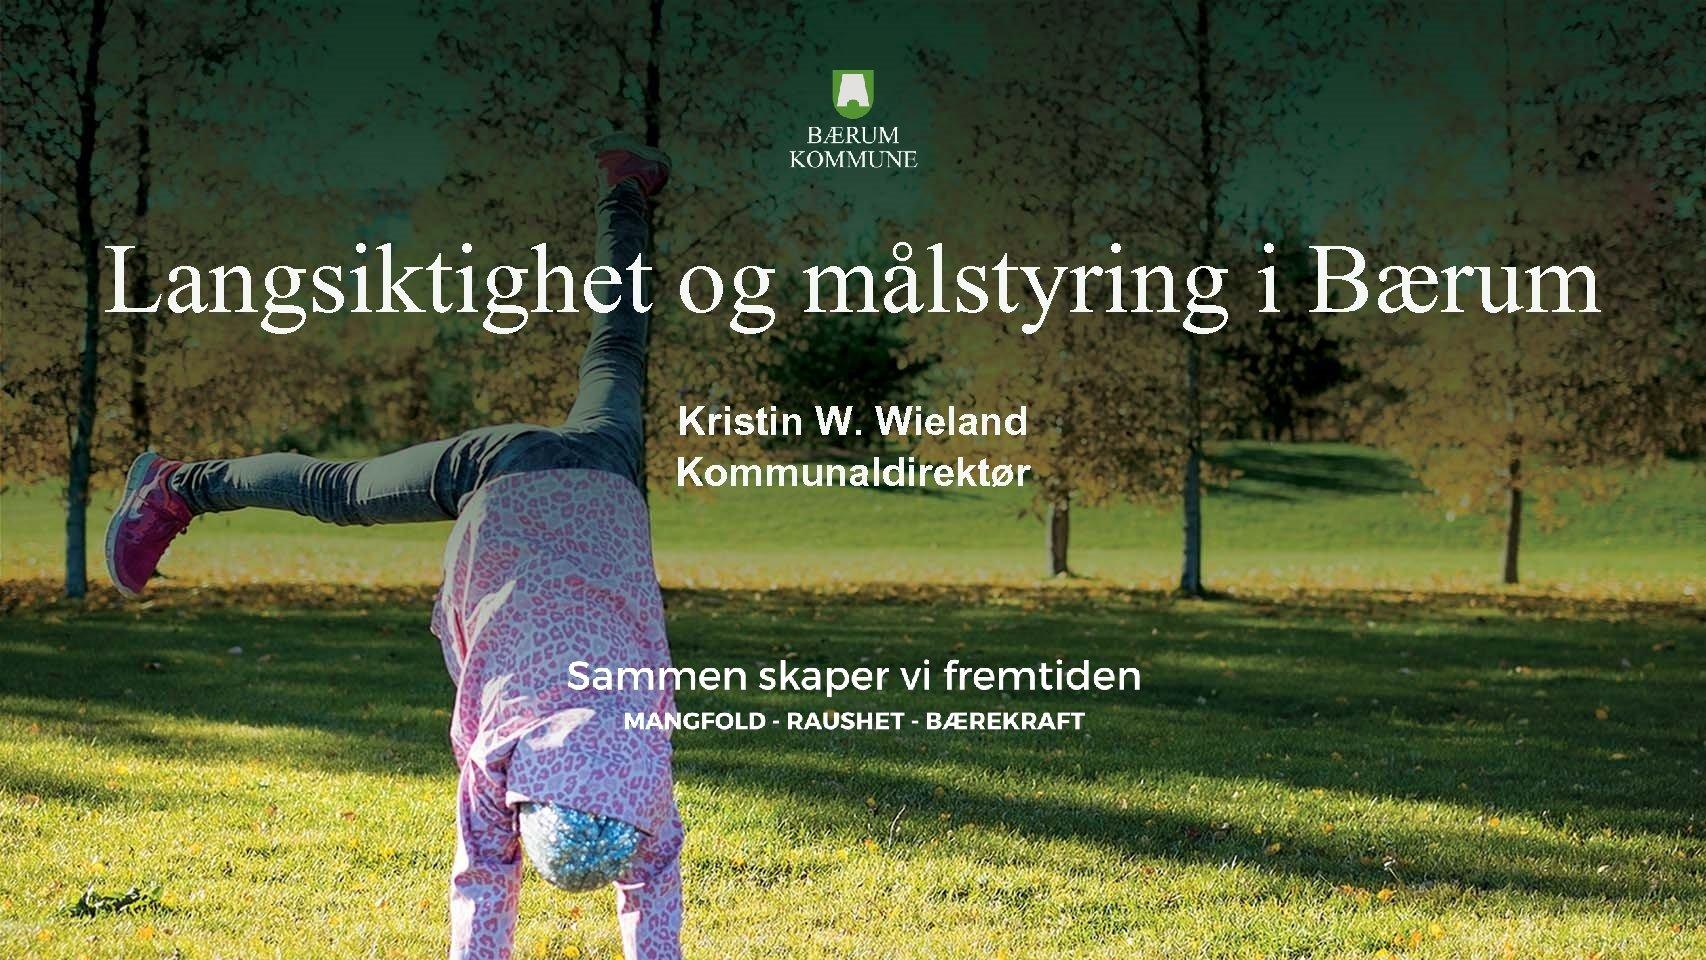 Langsiktighet og målstyring i Bærum Kristin W. Wieland Kommunaldirektør